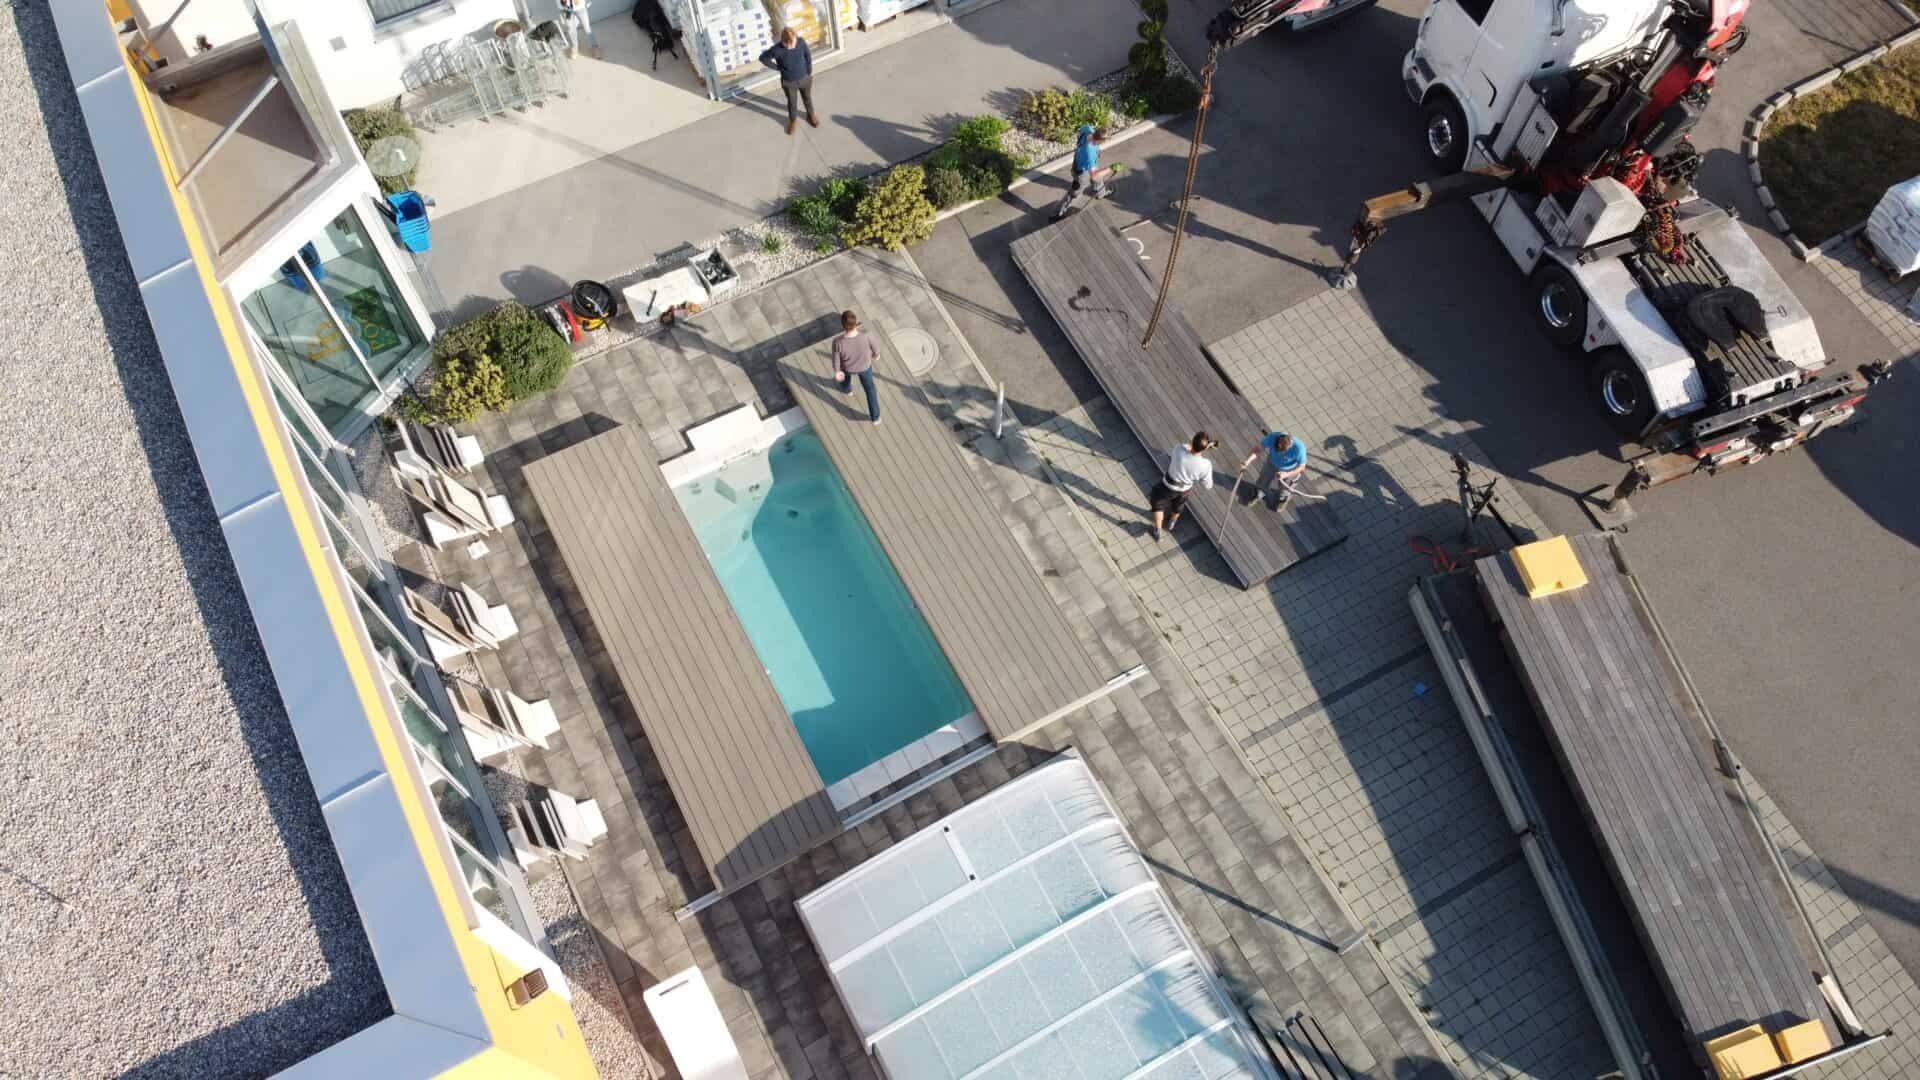 drohnenblick auf pool